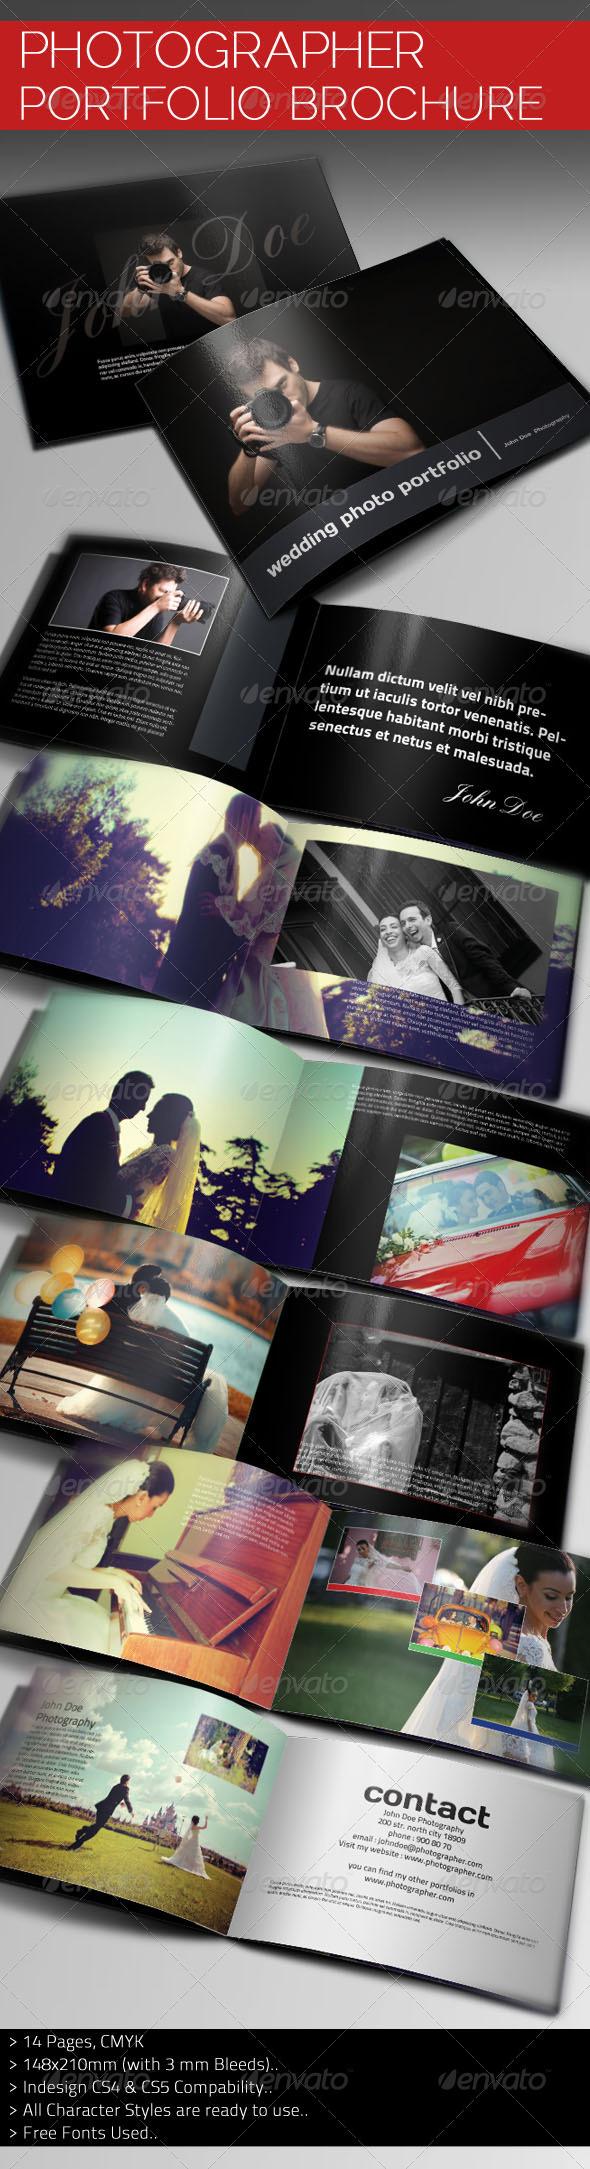 Photographer Portfolio Brochure Template - Portfolio Brochures